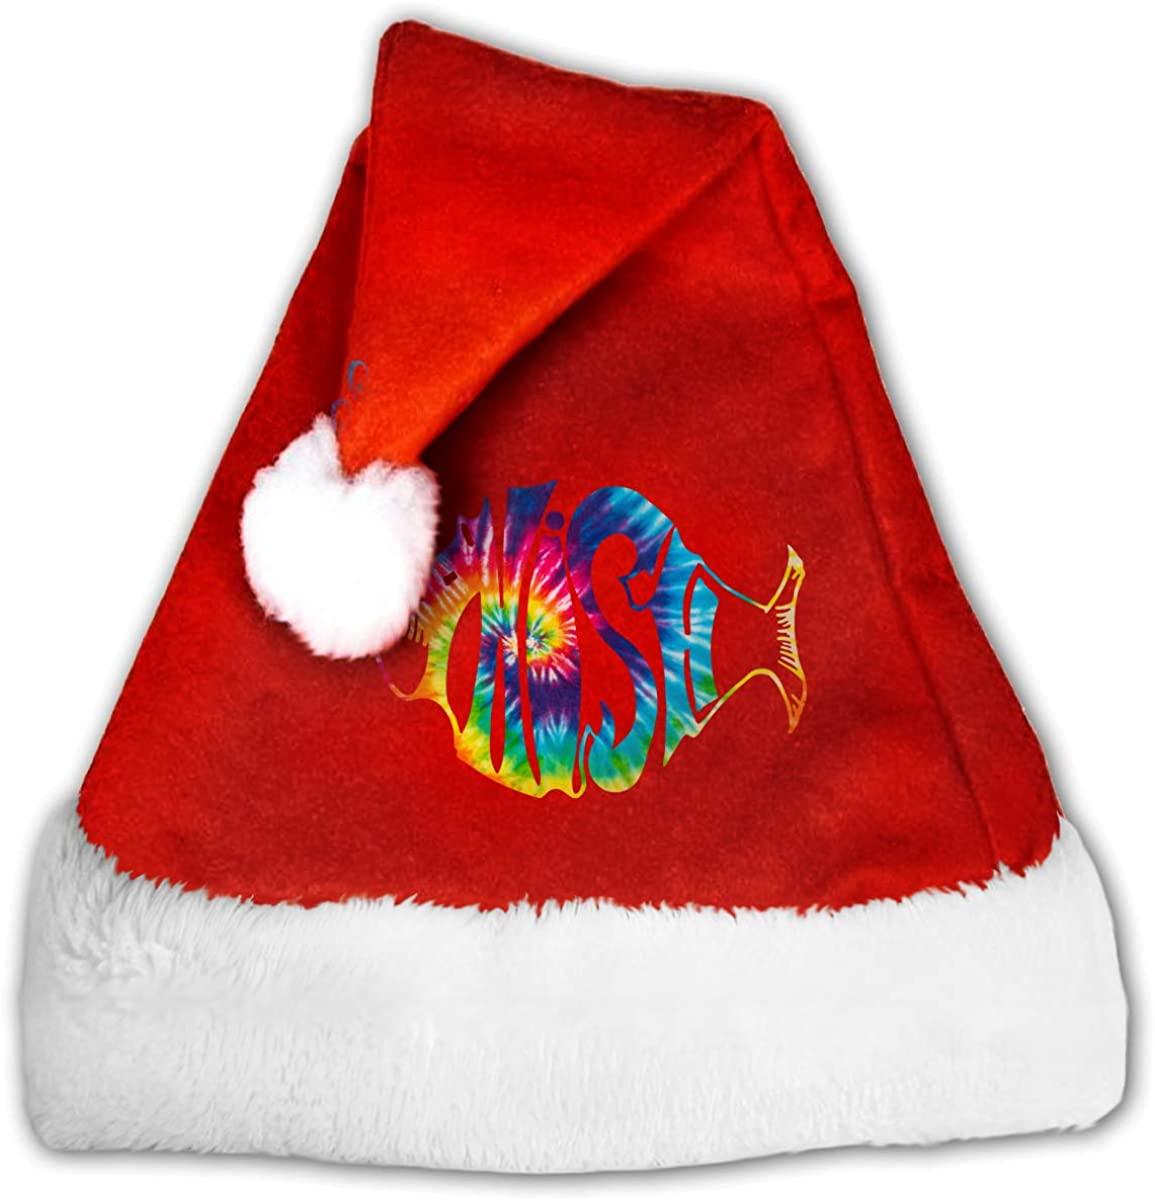 C-JOY Christmas Hat Phish Band Logo Santa Hat for Kids and Adults